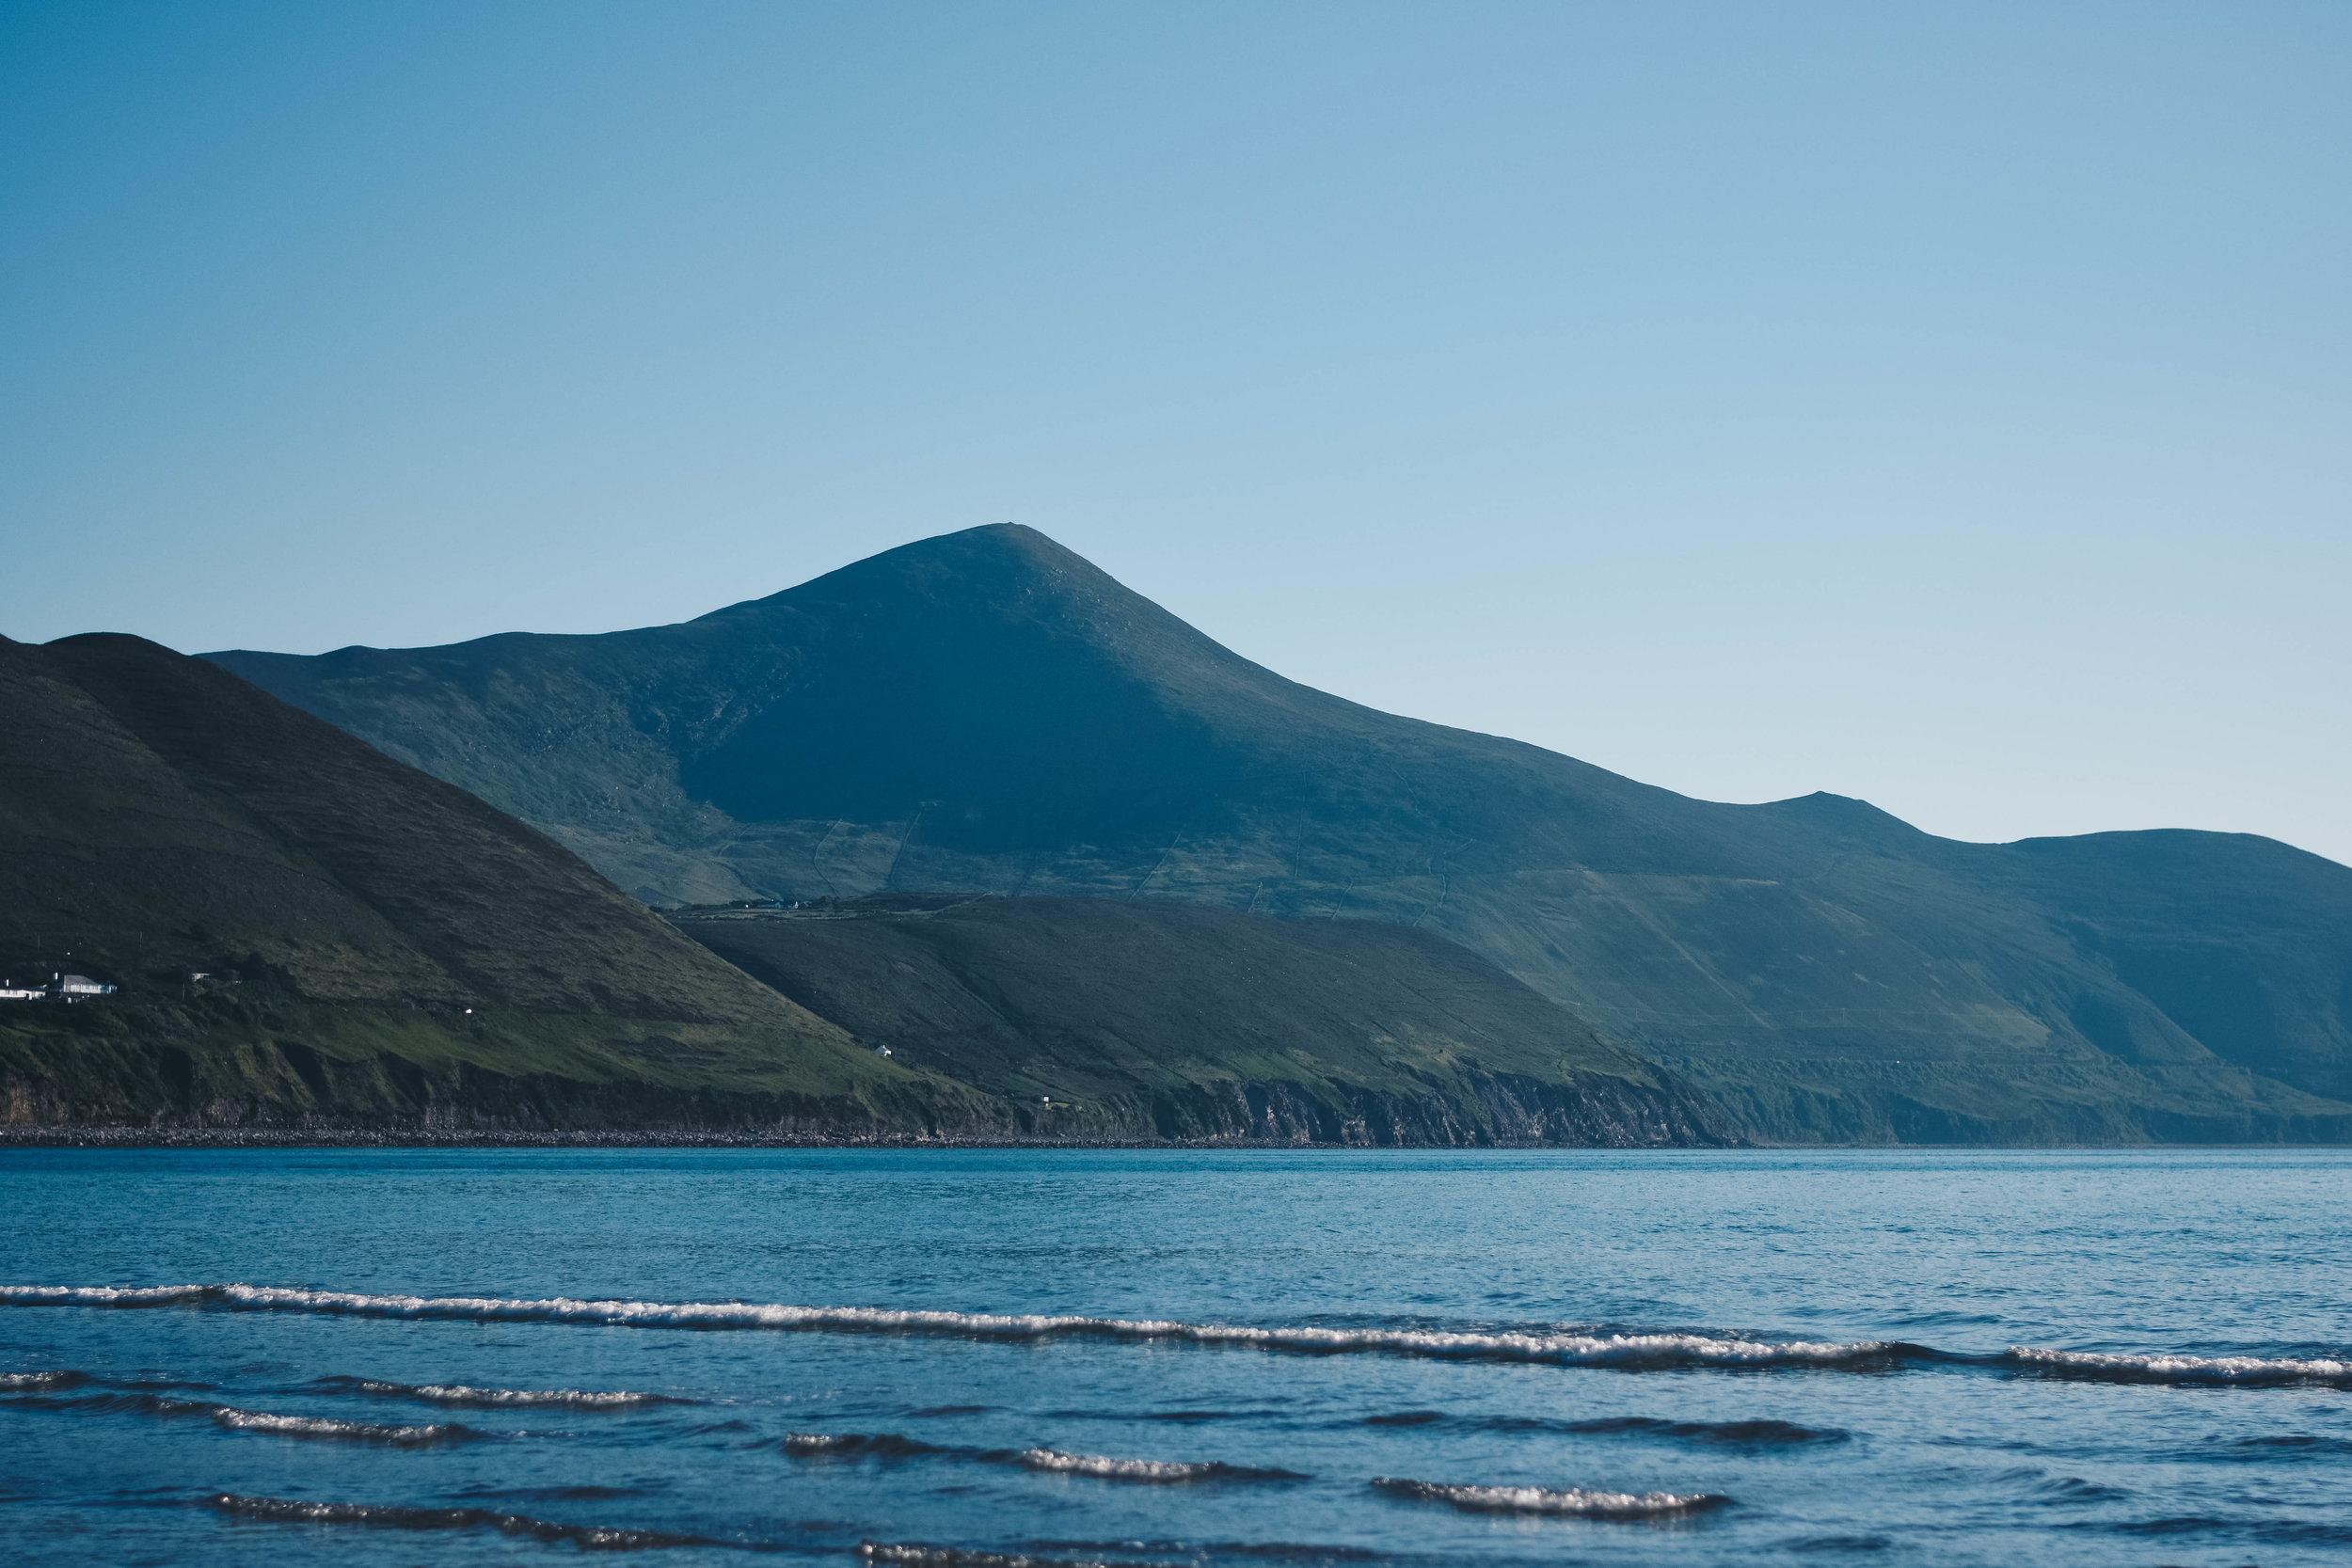 Island | Glenbeigh, Ireland | June 2016